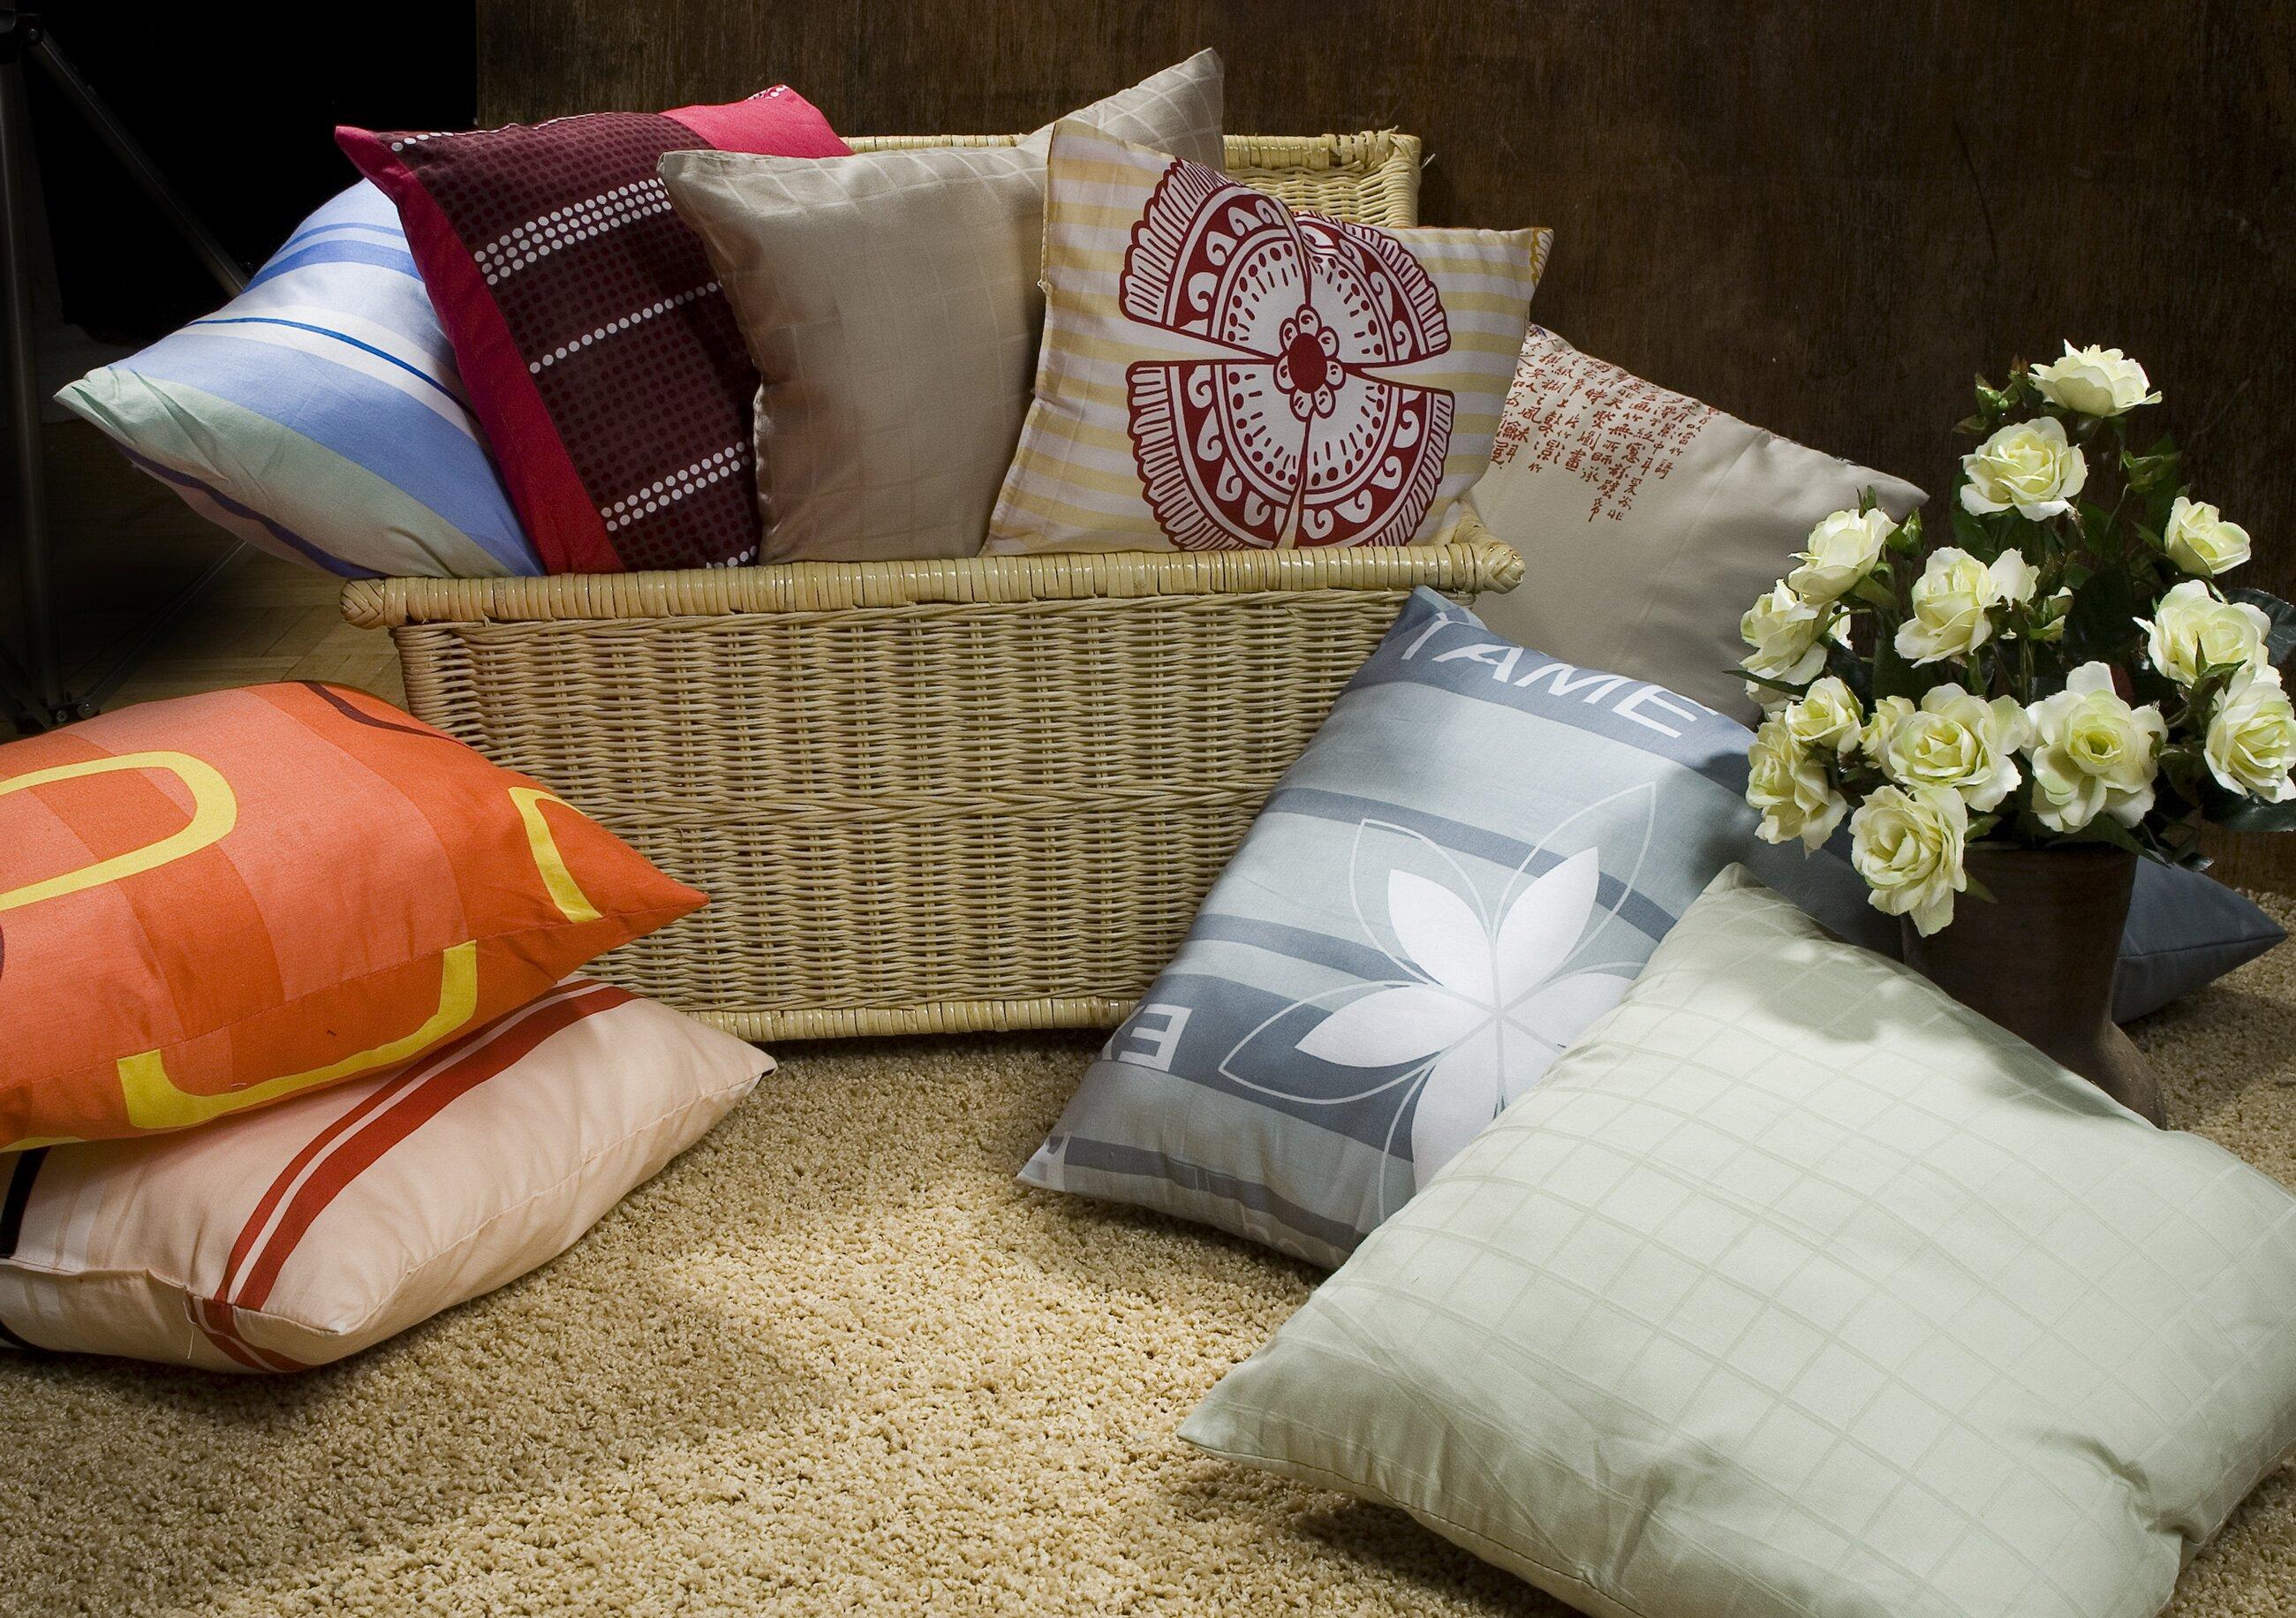 Декоративные подушки Guten Morgen gmg493993